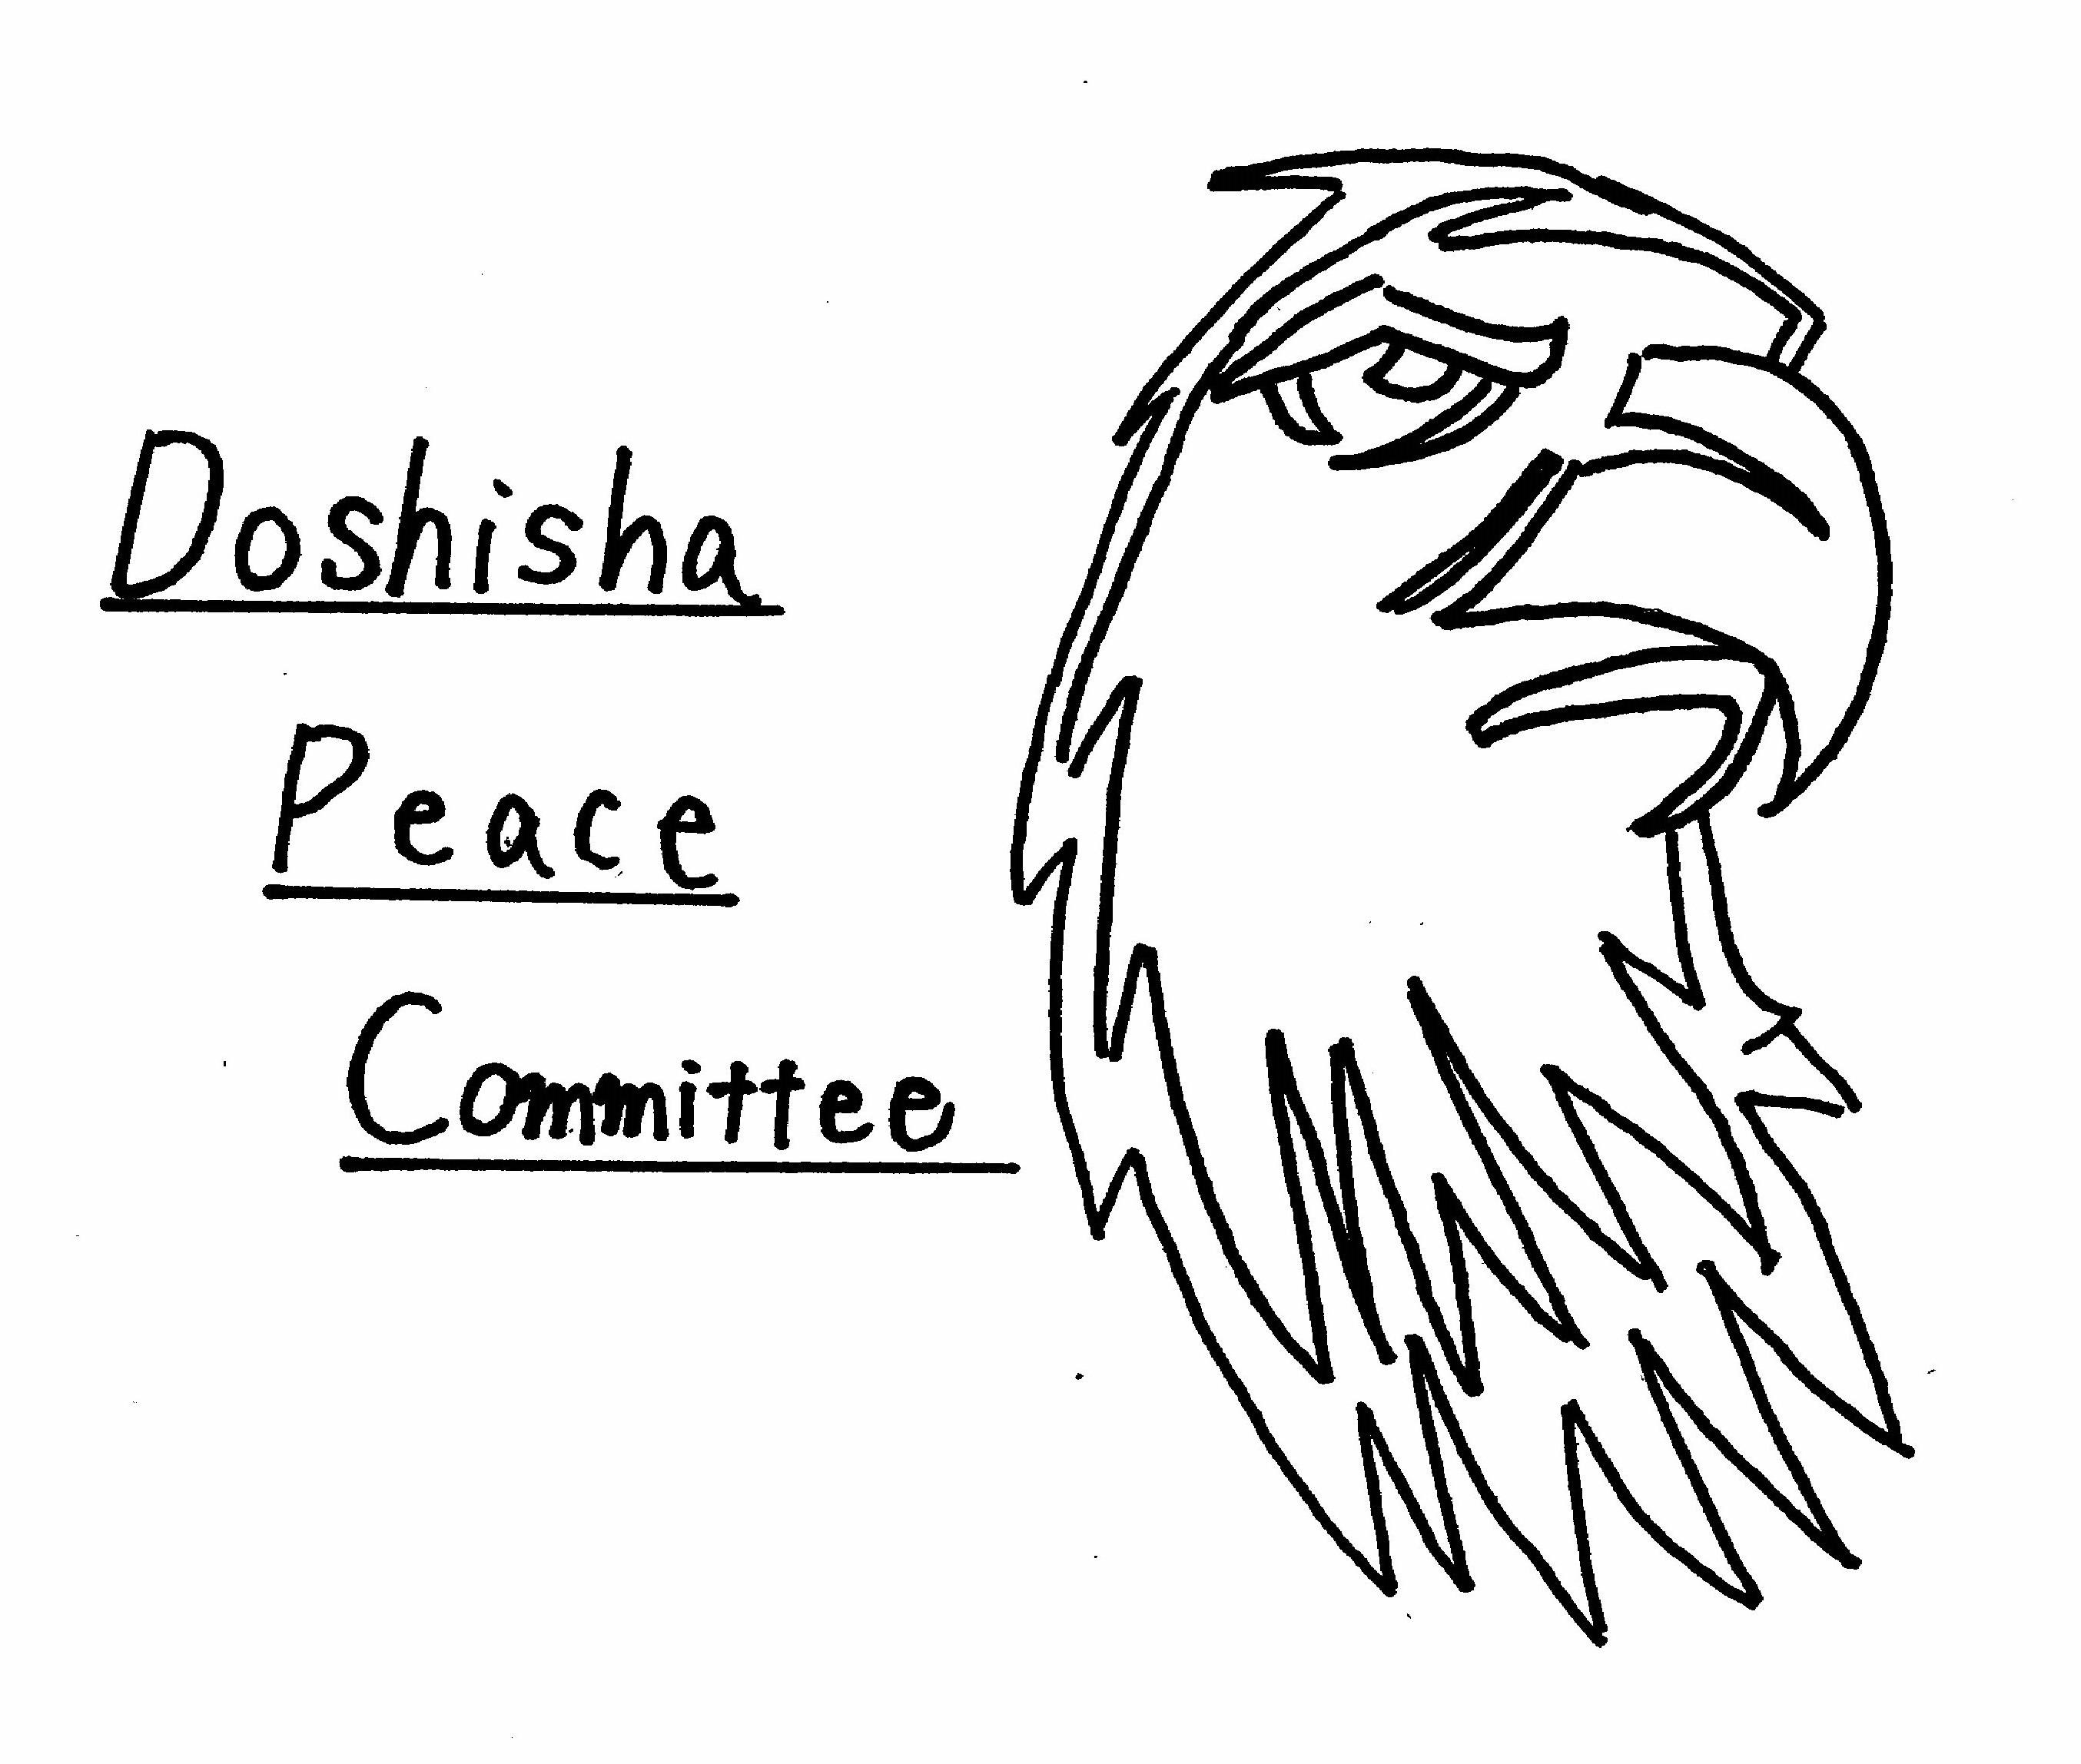 DoshishaPeaceCommittee